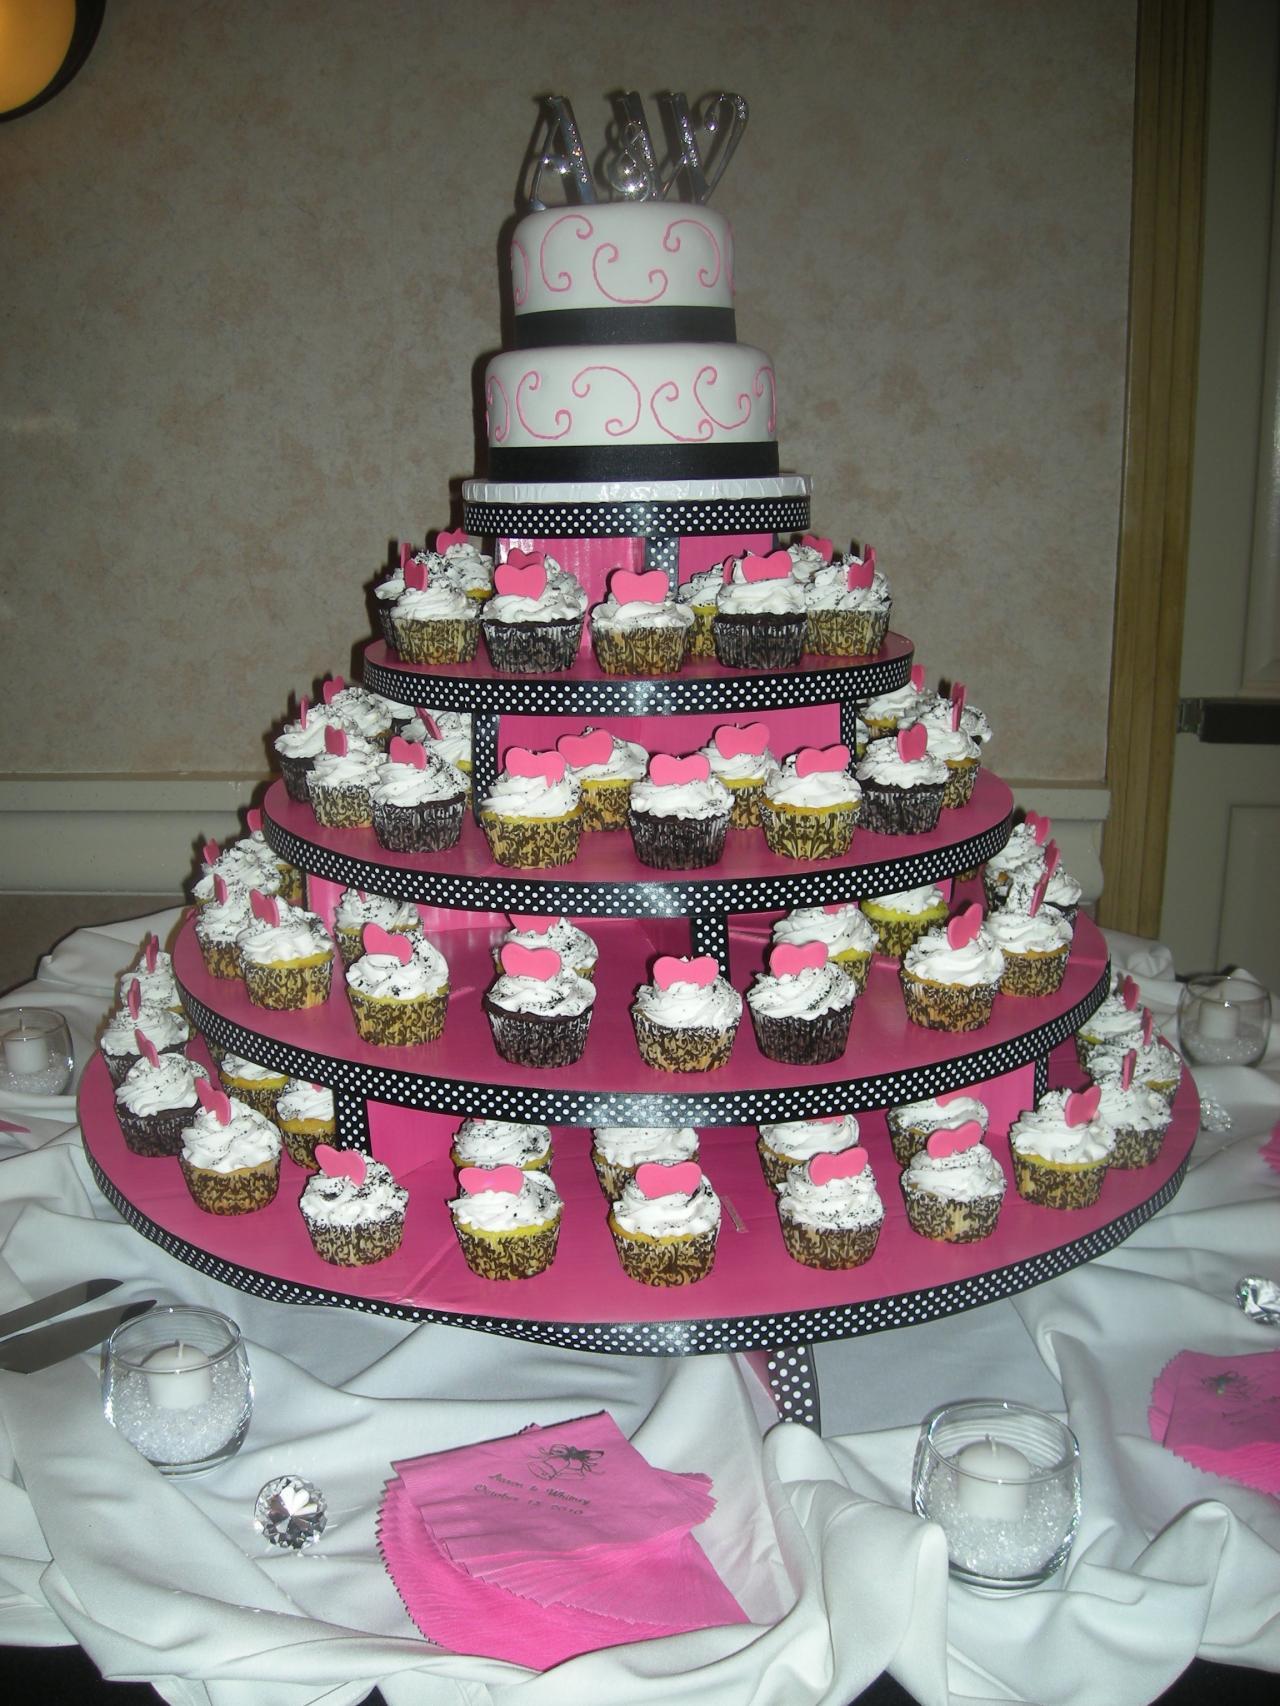 Wedding Cakes Gallery  My Goodness Cakes Wedding Cake Gallery 1